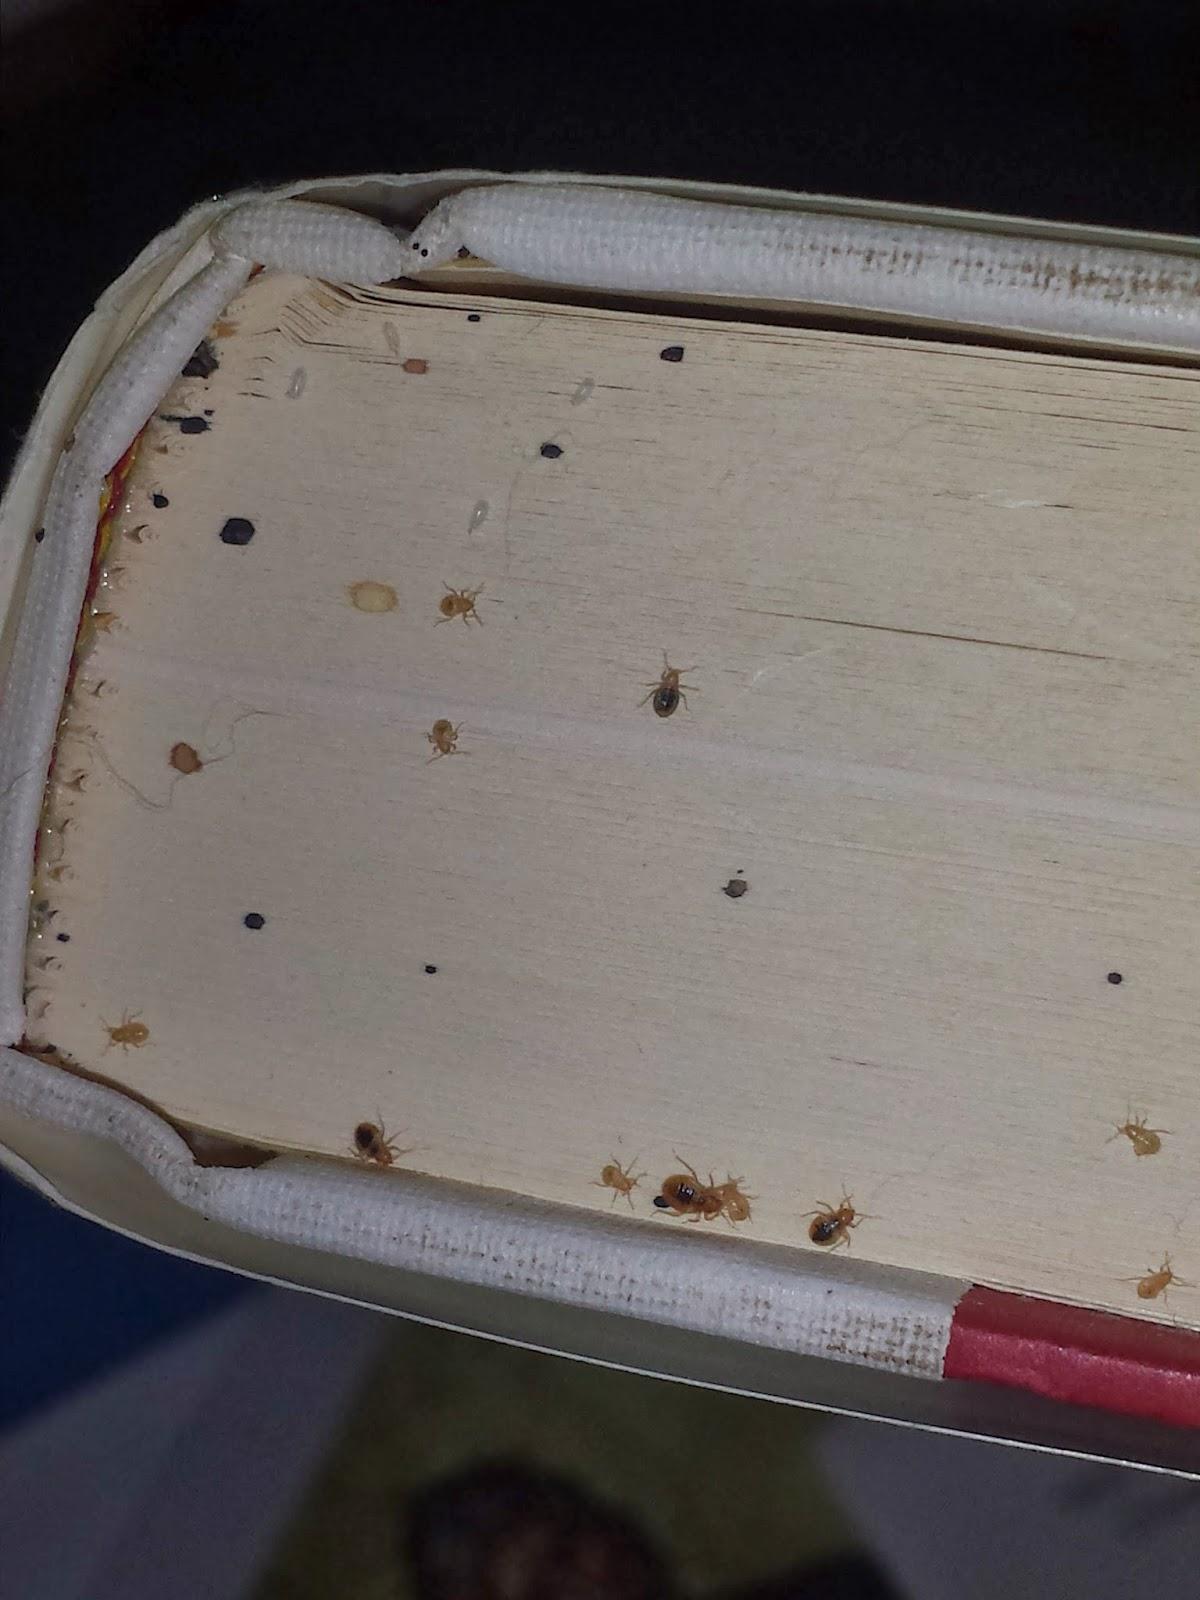 Bedbugschicago 855 855 Bugs Bed Bugs On Your Books